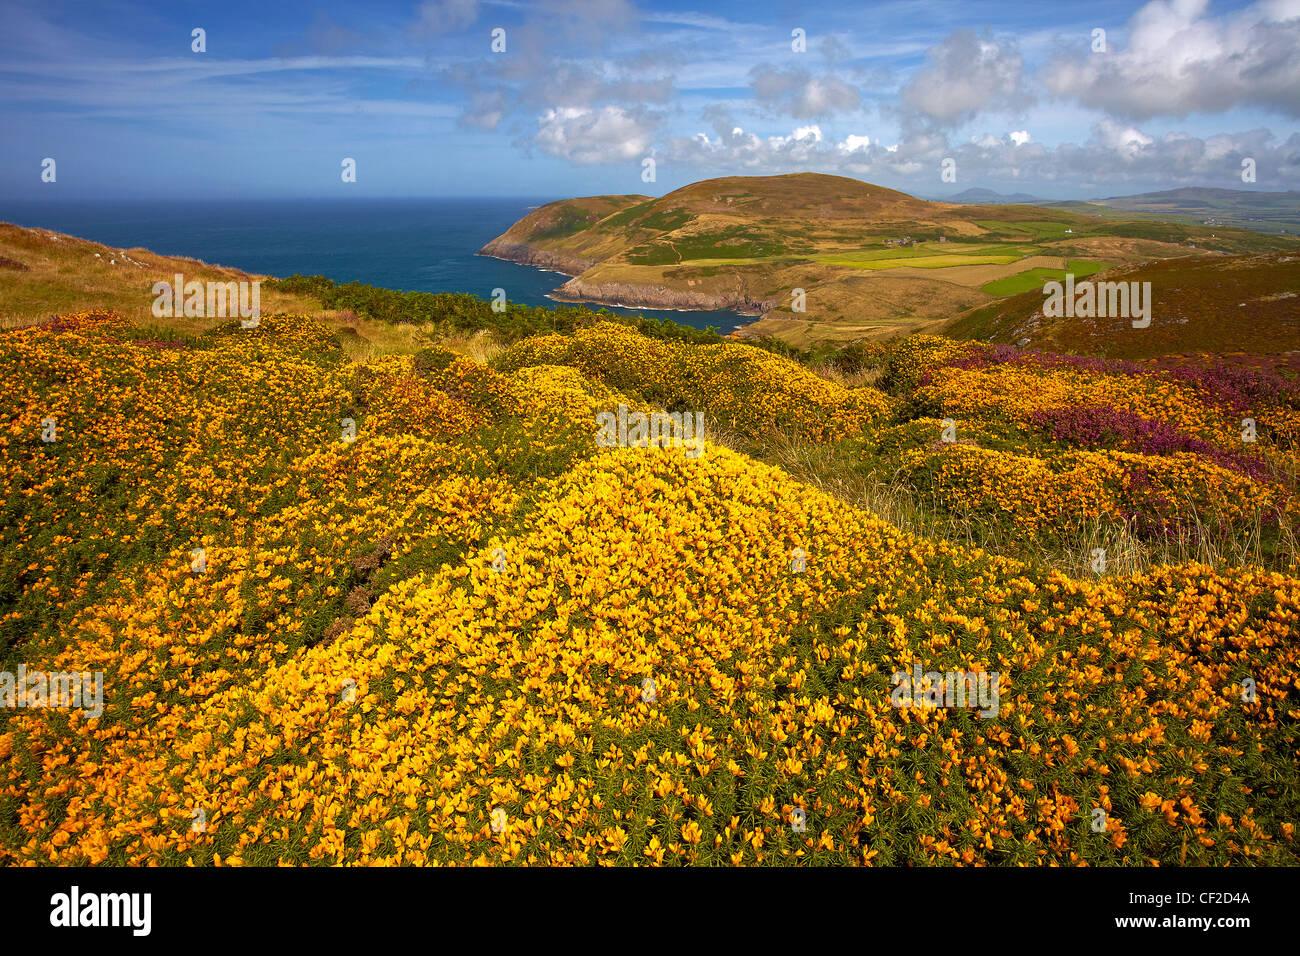 View of Lleyn peninsula coast from Myndd Mawr. - Stock Image